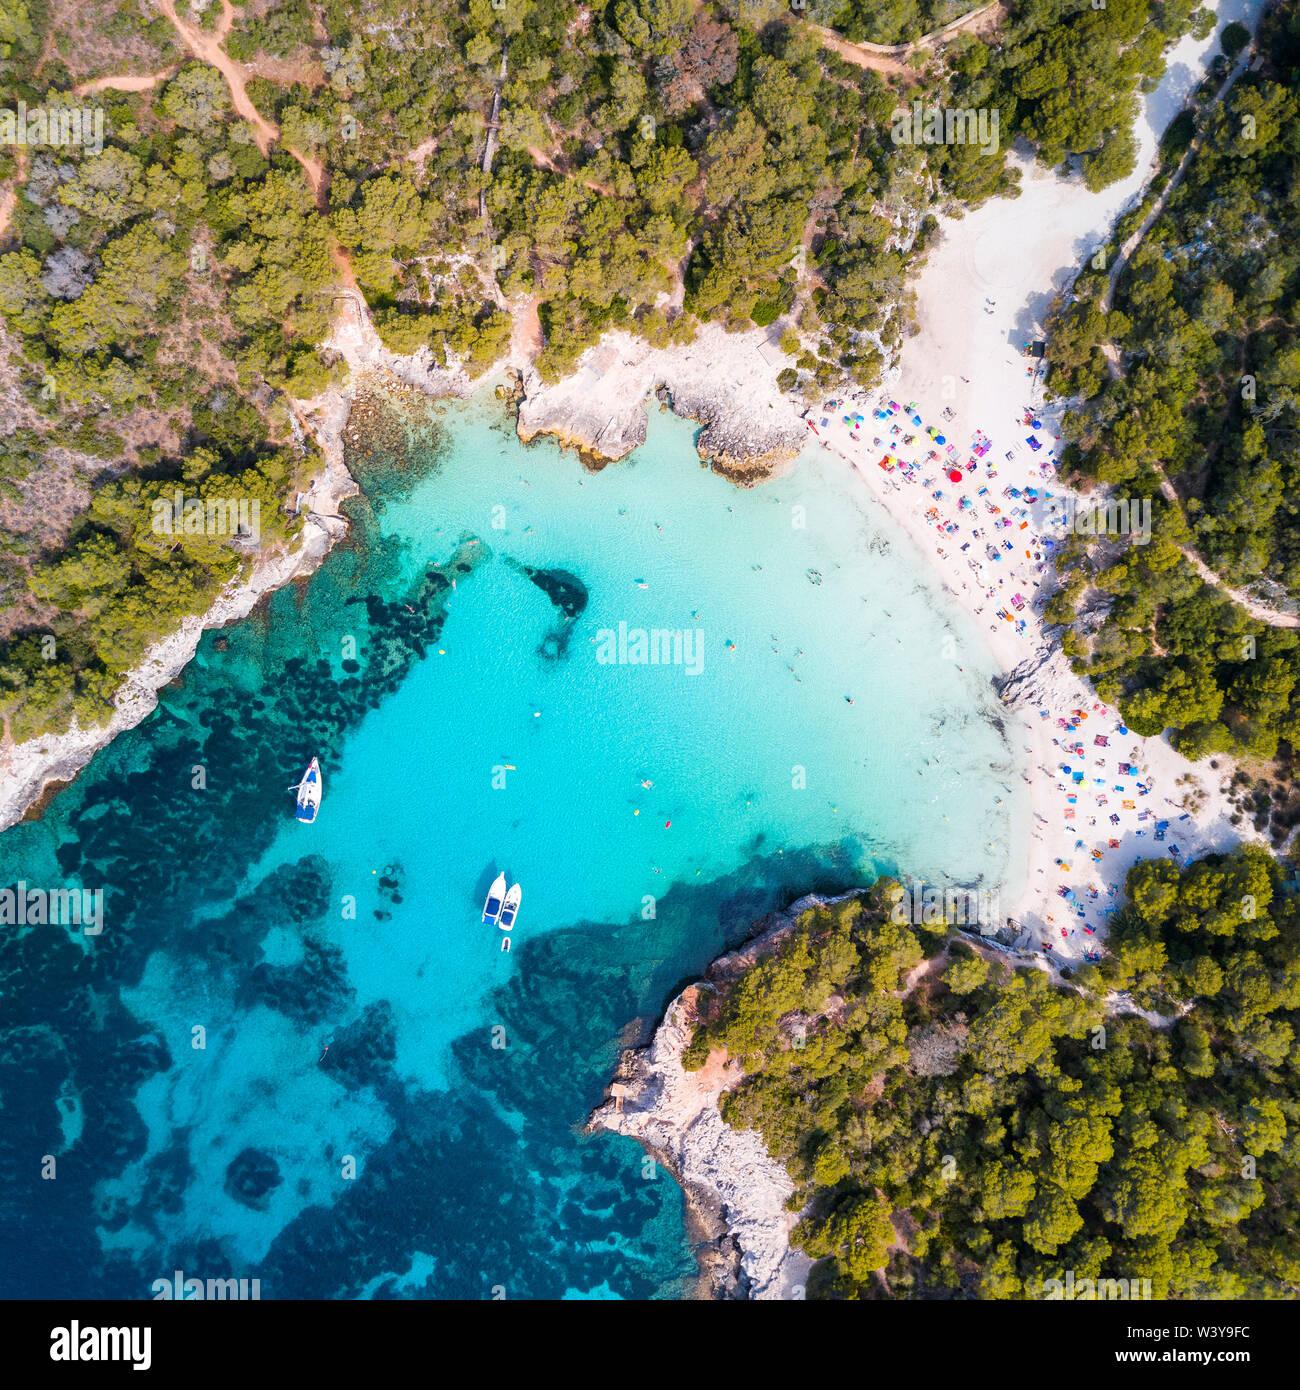 Aerial view of Cala Turqueta beach, Menorca, Balearic Islands, Spain - Stock Image